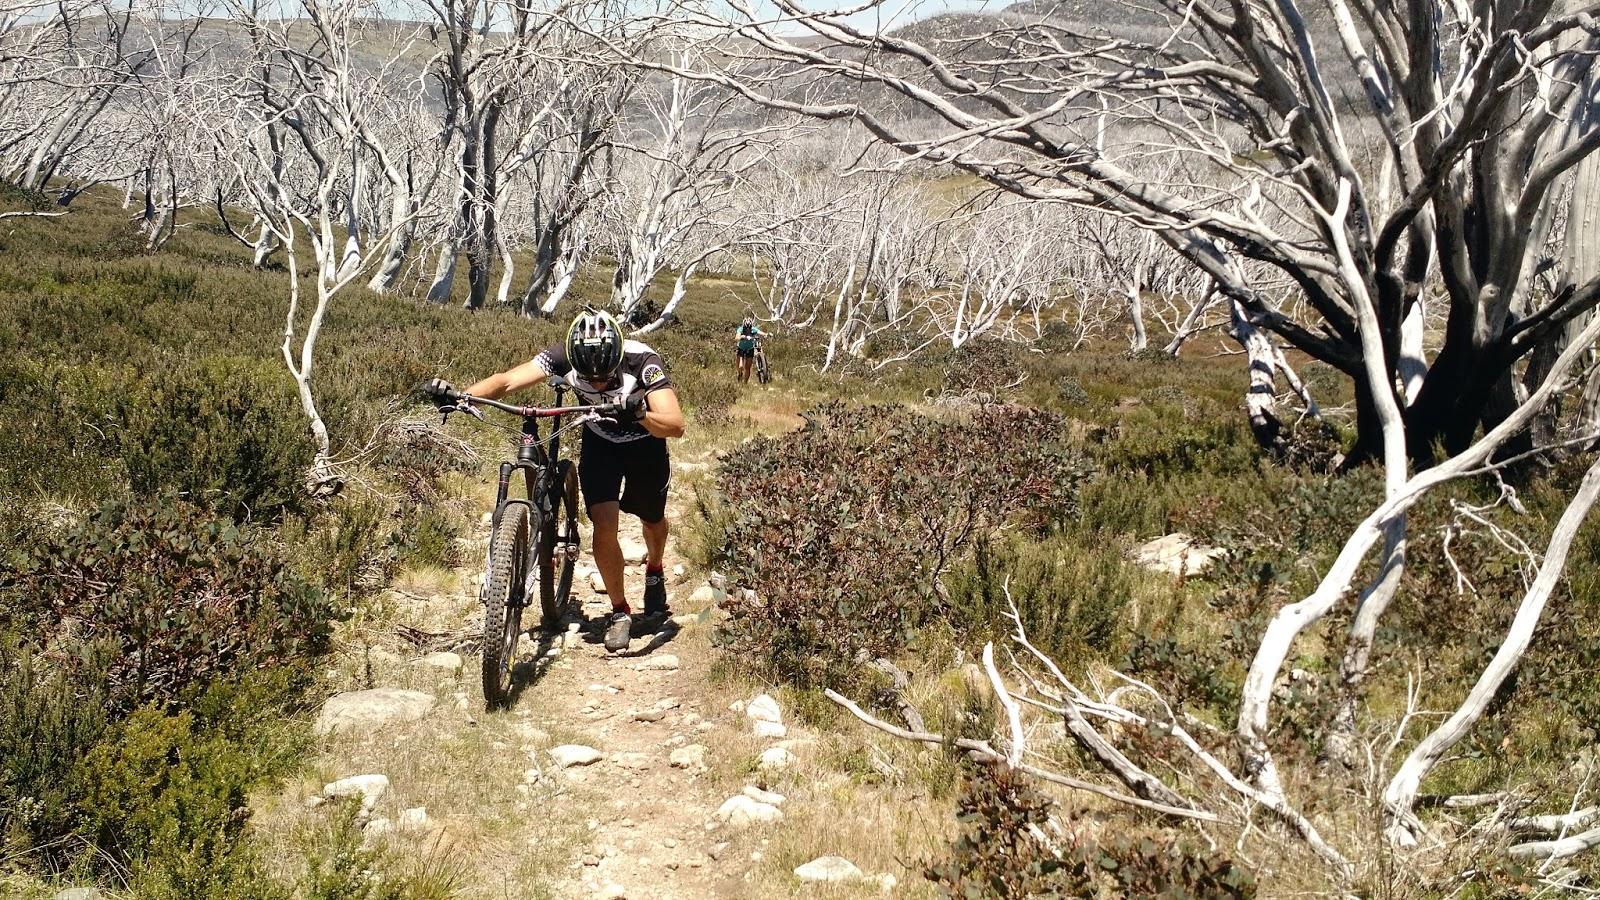 BMX Bicycle Outdoor Handlebar Grip BMX MTB Cycling Bicycle Lot of 5 prs URBAN